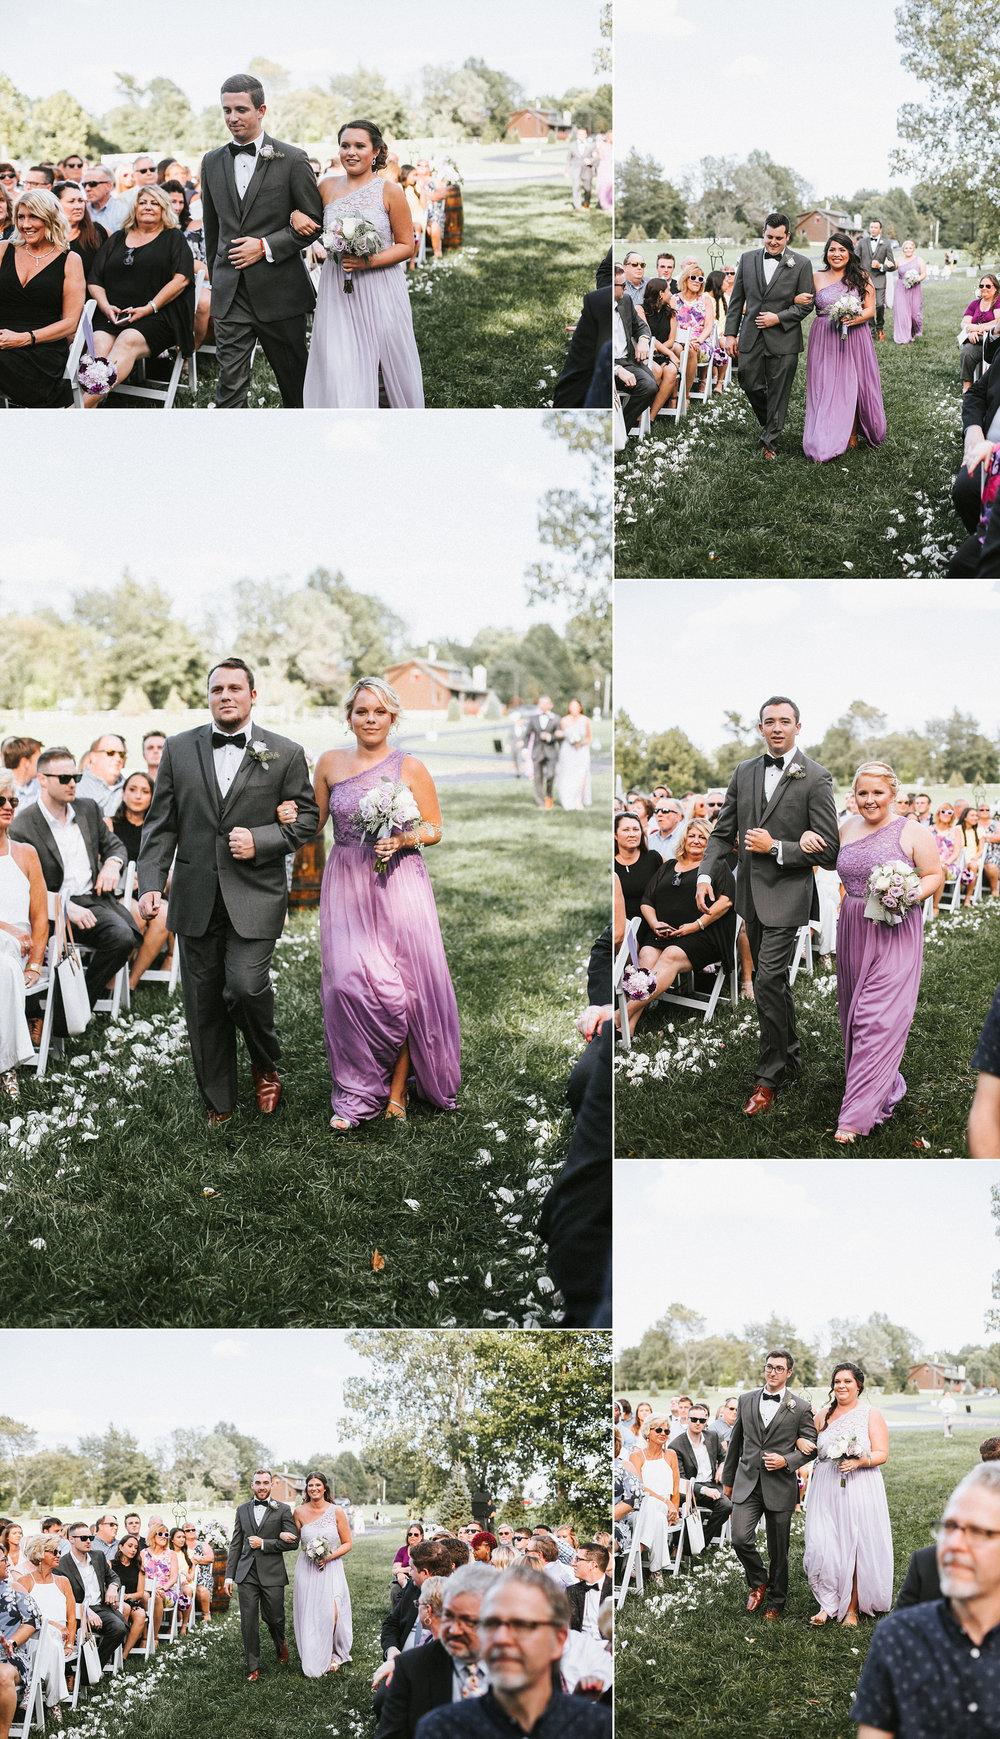 Brooke Townsend Photography - Cincinnati Wedding Photographer (90 of 230).jpg